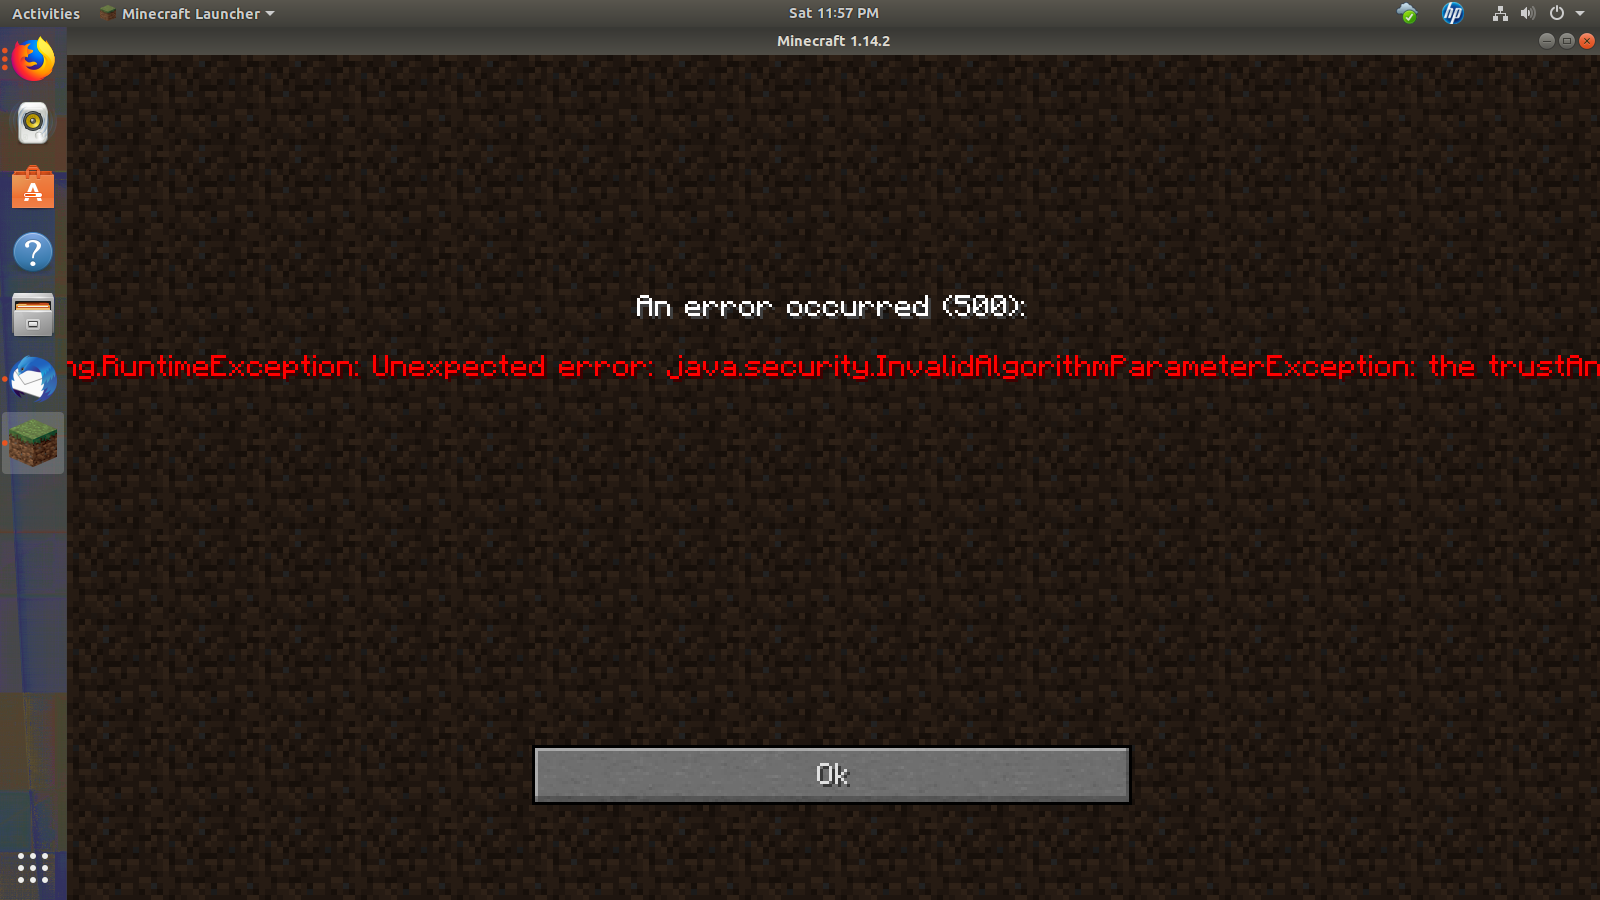 MC-154197] Server issues - Jira